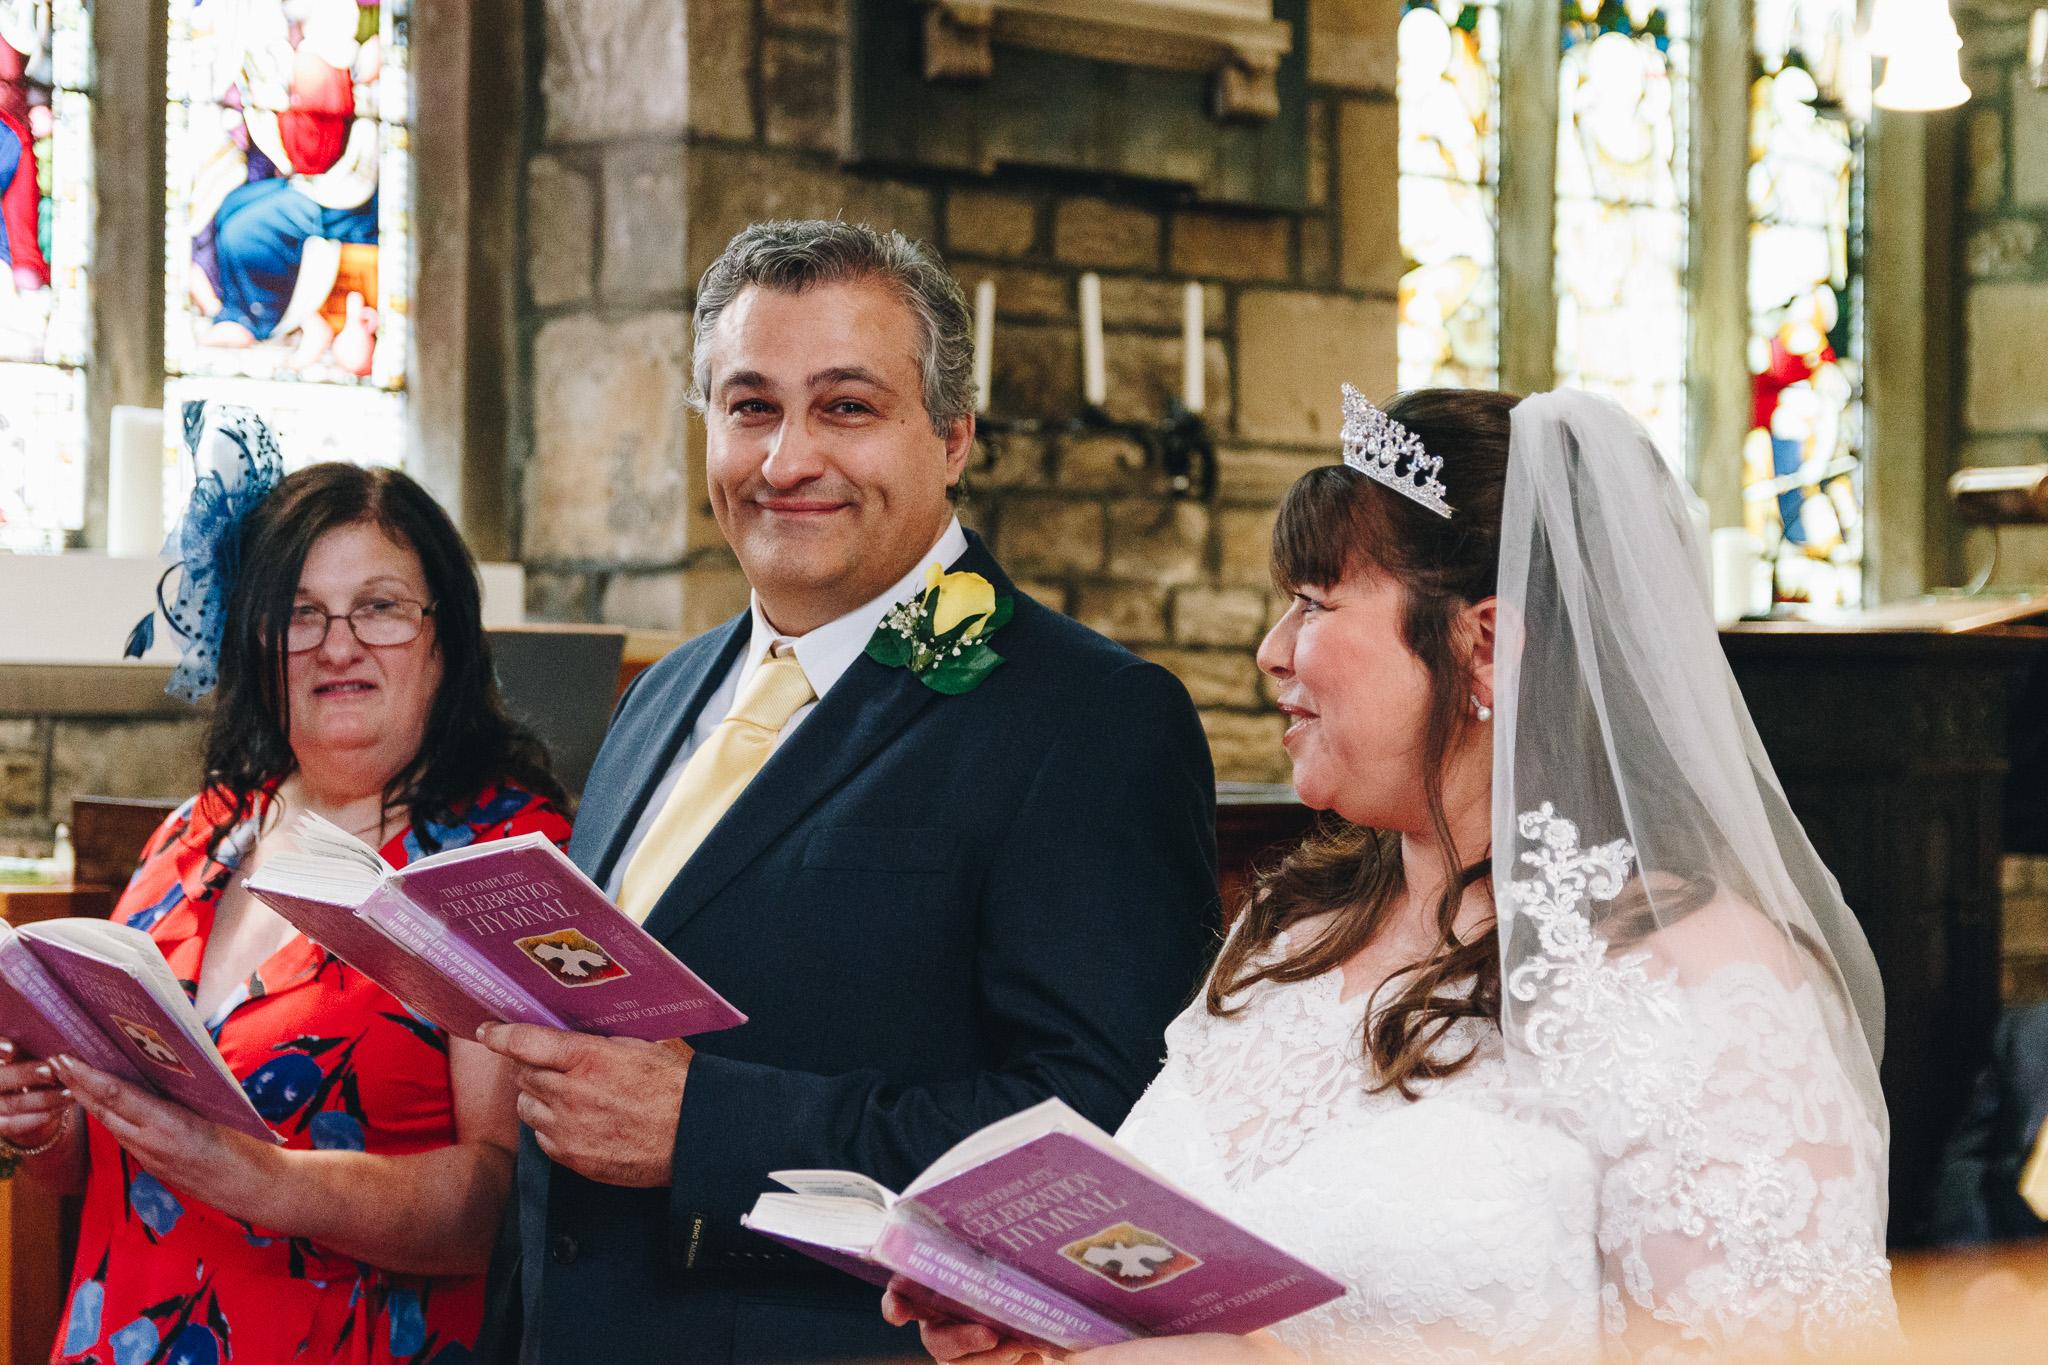 Nat and Sergio Wedding Photos - Website Quality_042.jpg